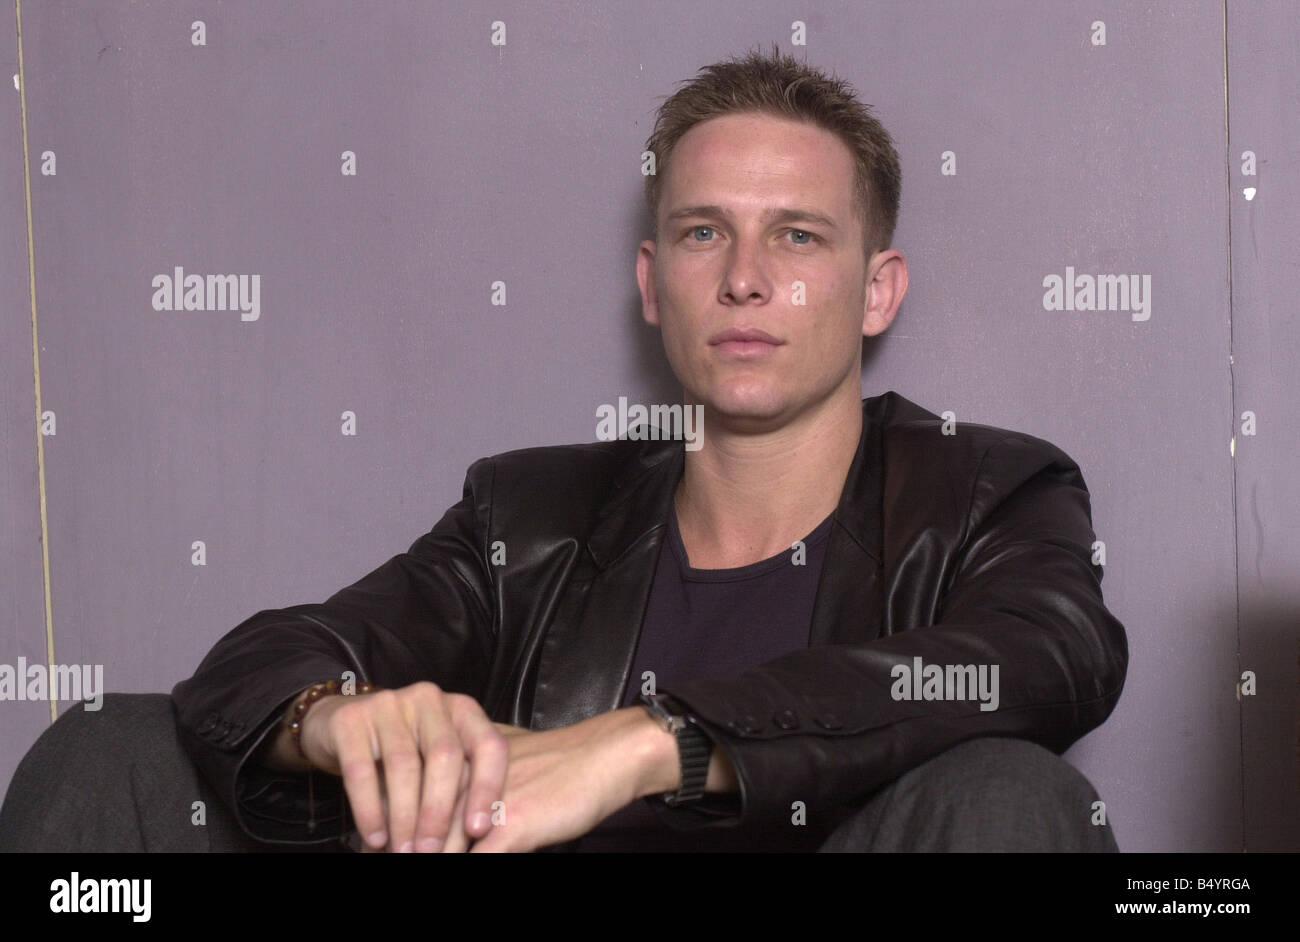 JONATHAN KERRIGAN August 2000 Actor NINA MYSKOW INTERVIEW Mirrorpix - Stock Image